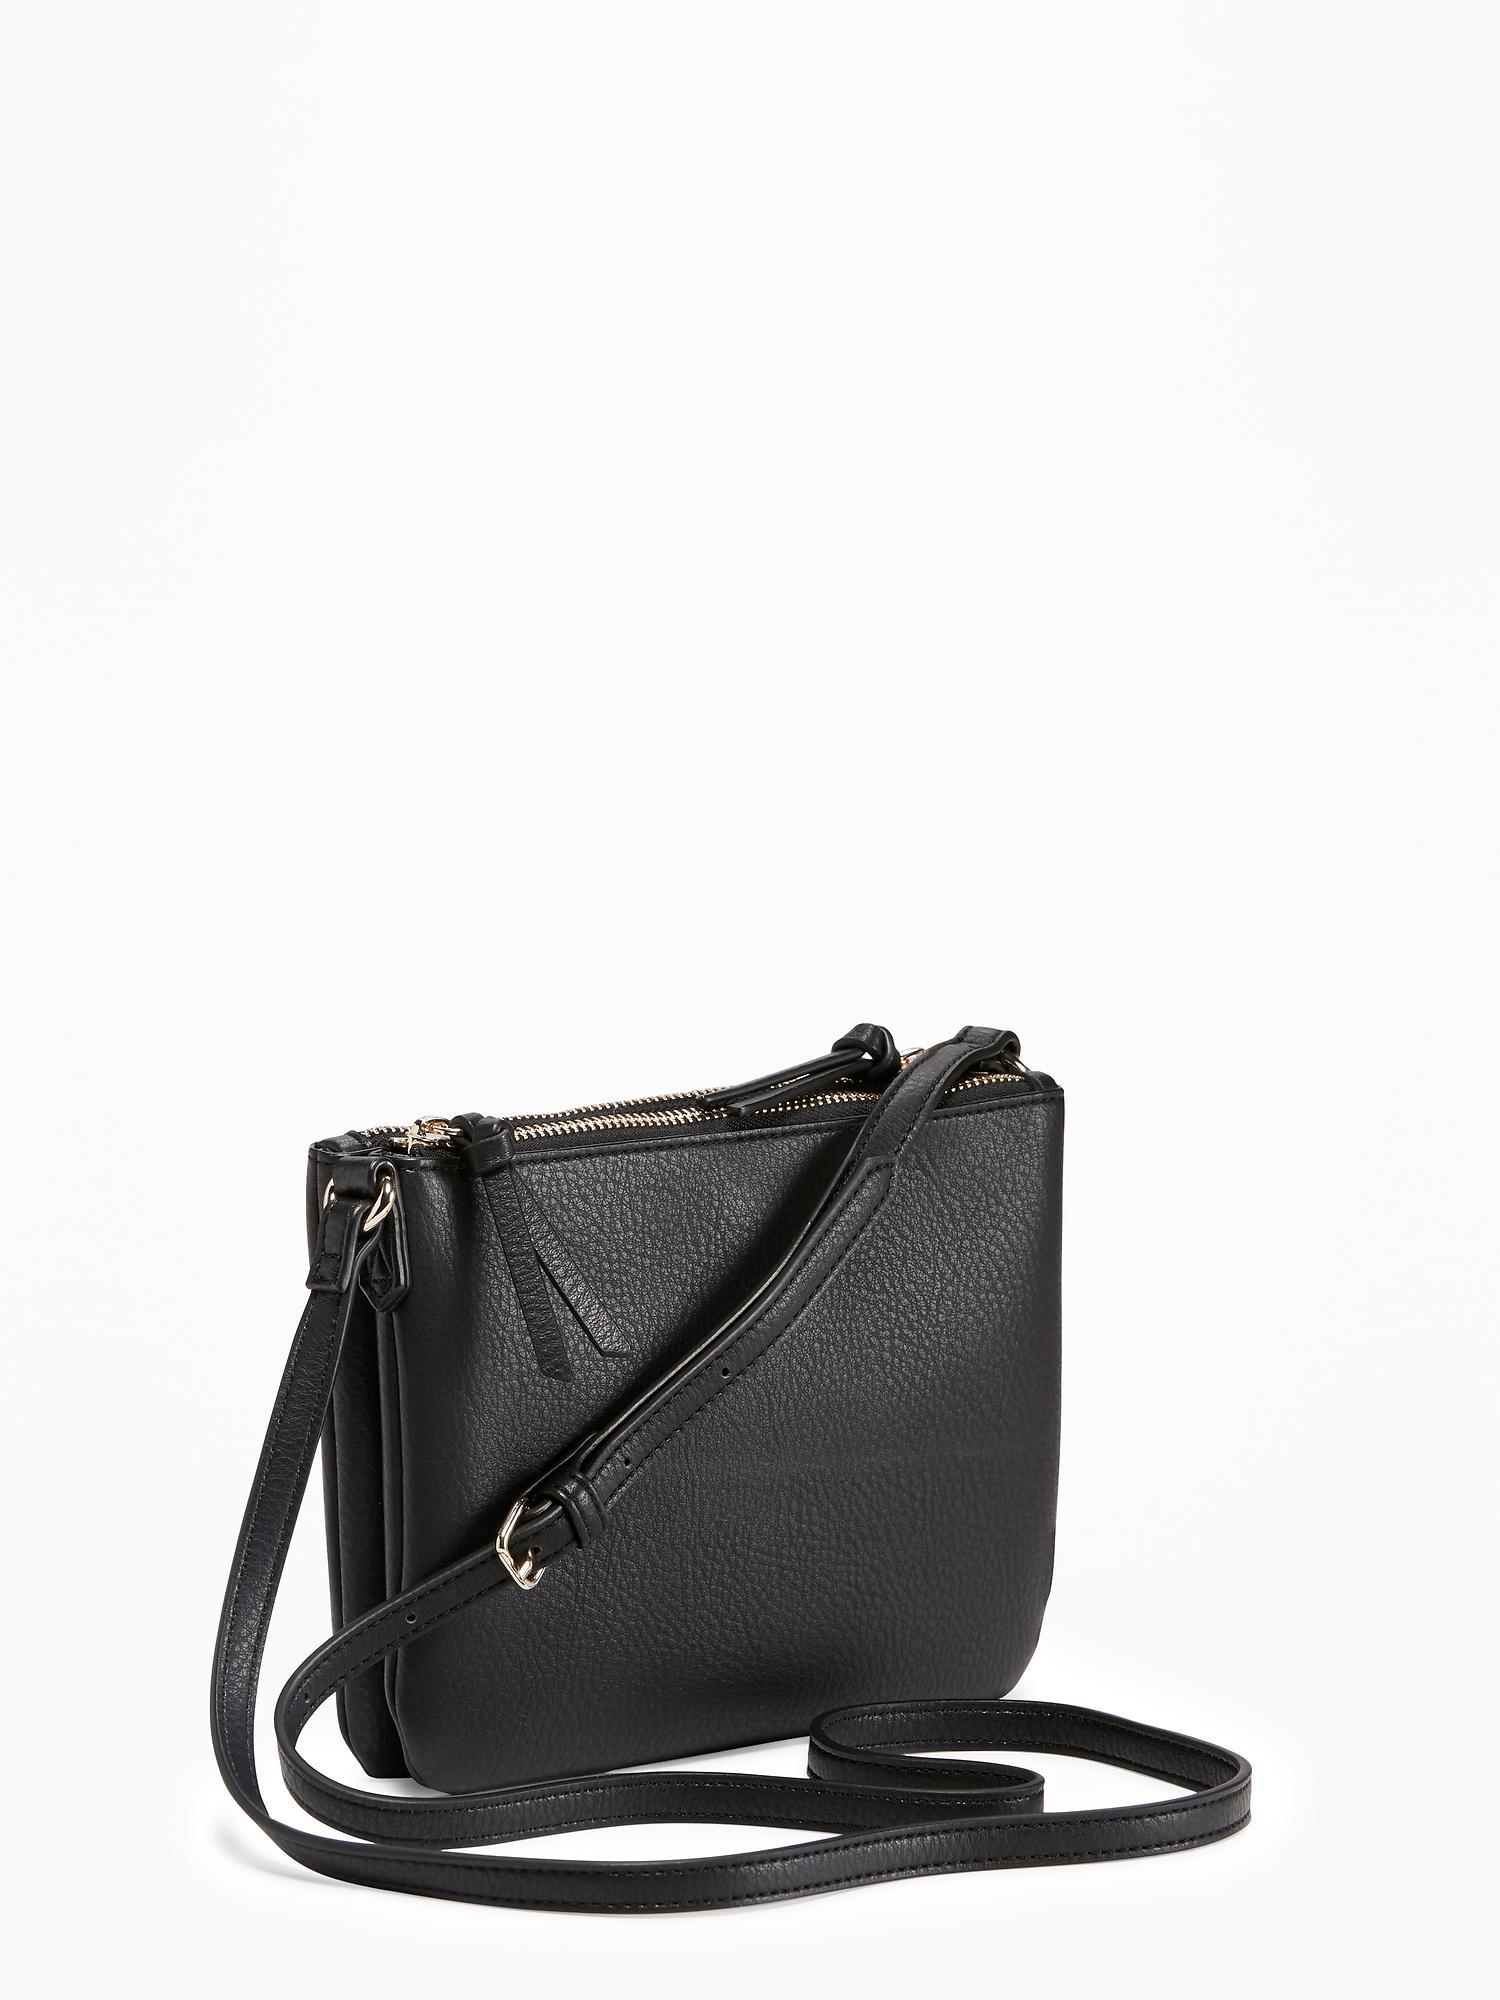 Dual-Zip Crossbody Bag for Women